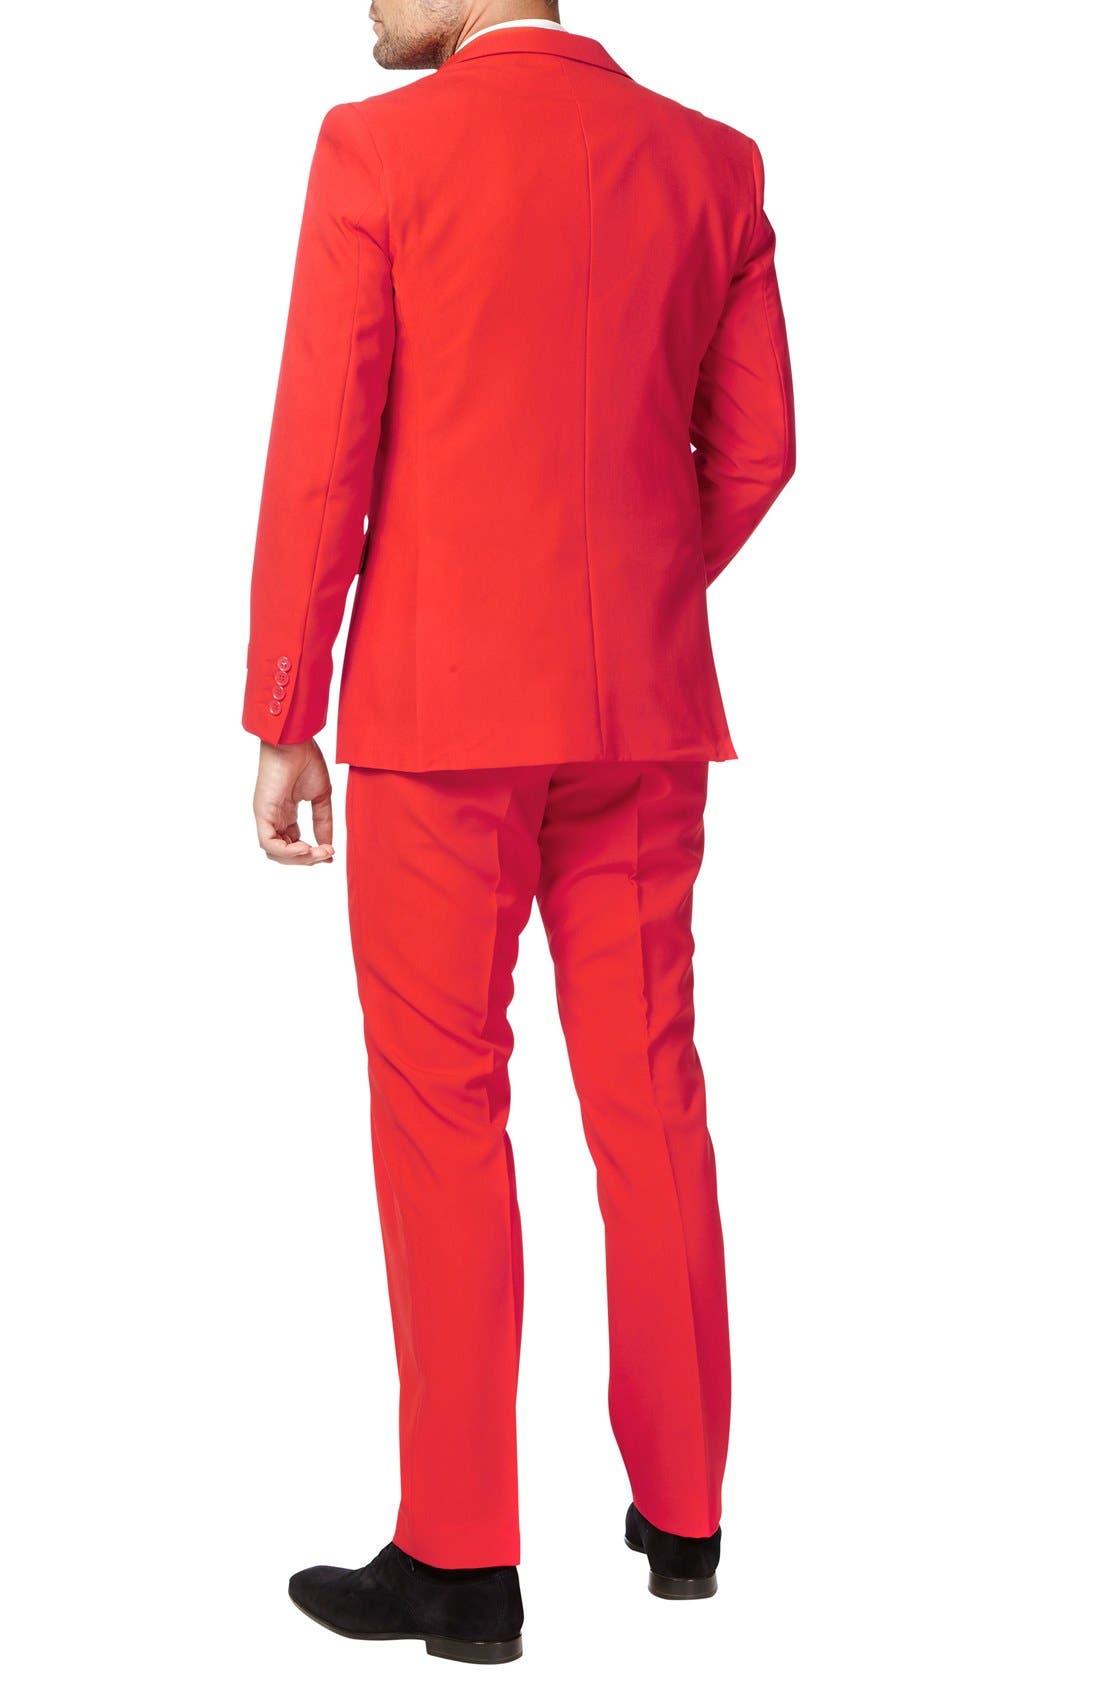 OppoSuit 'Red Devil' Trim Fit Two-Piece Suit with Tie,                             Alternate thumbnail 2, color,                             610